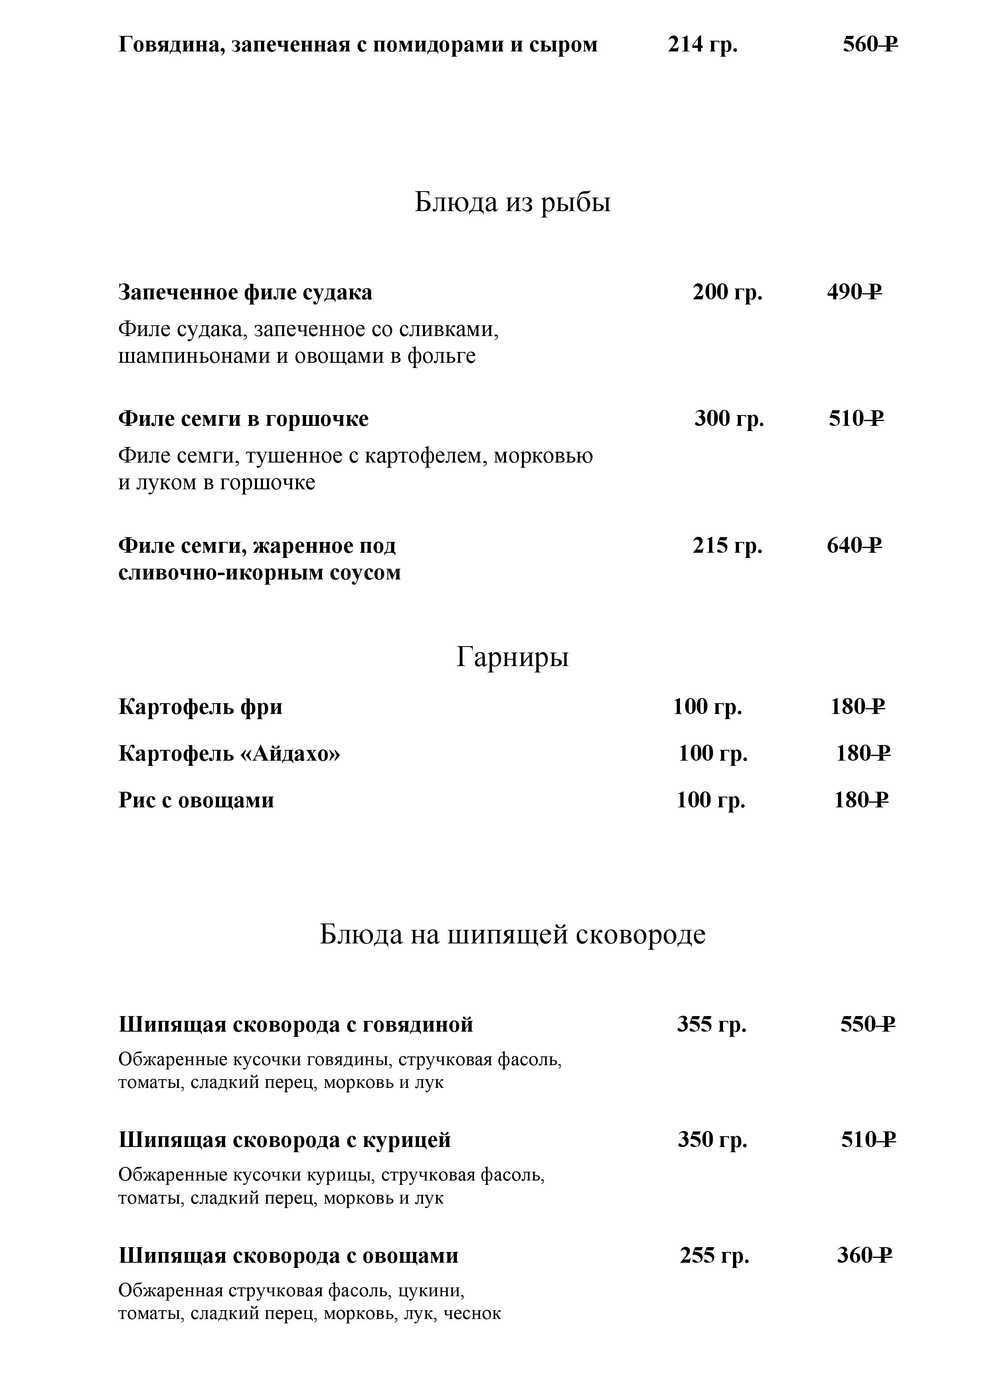 Меню ресторана Навруз на Ленинском проспекте фото 7